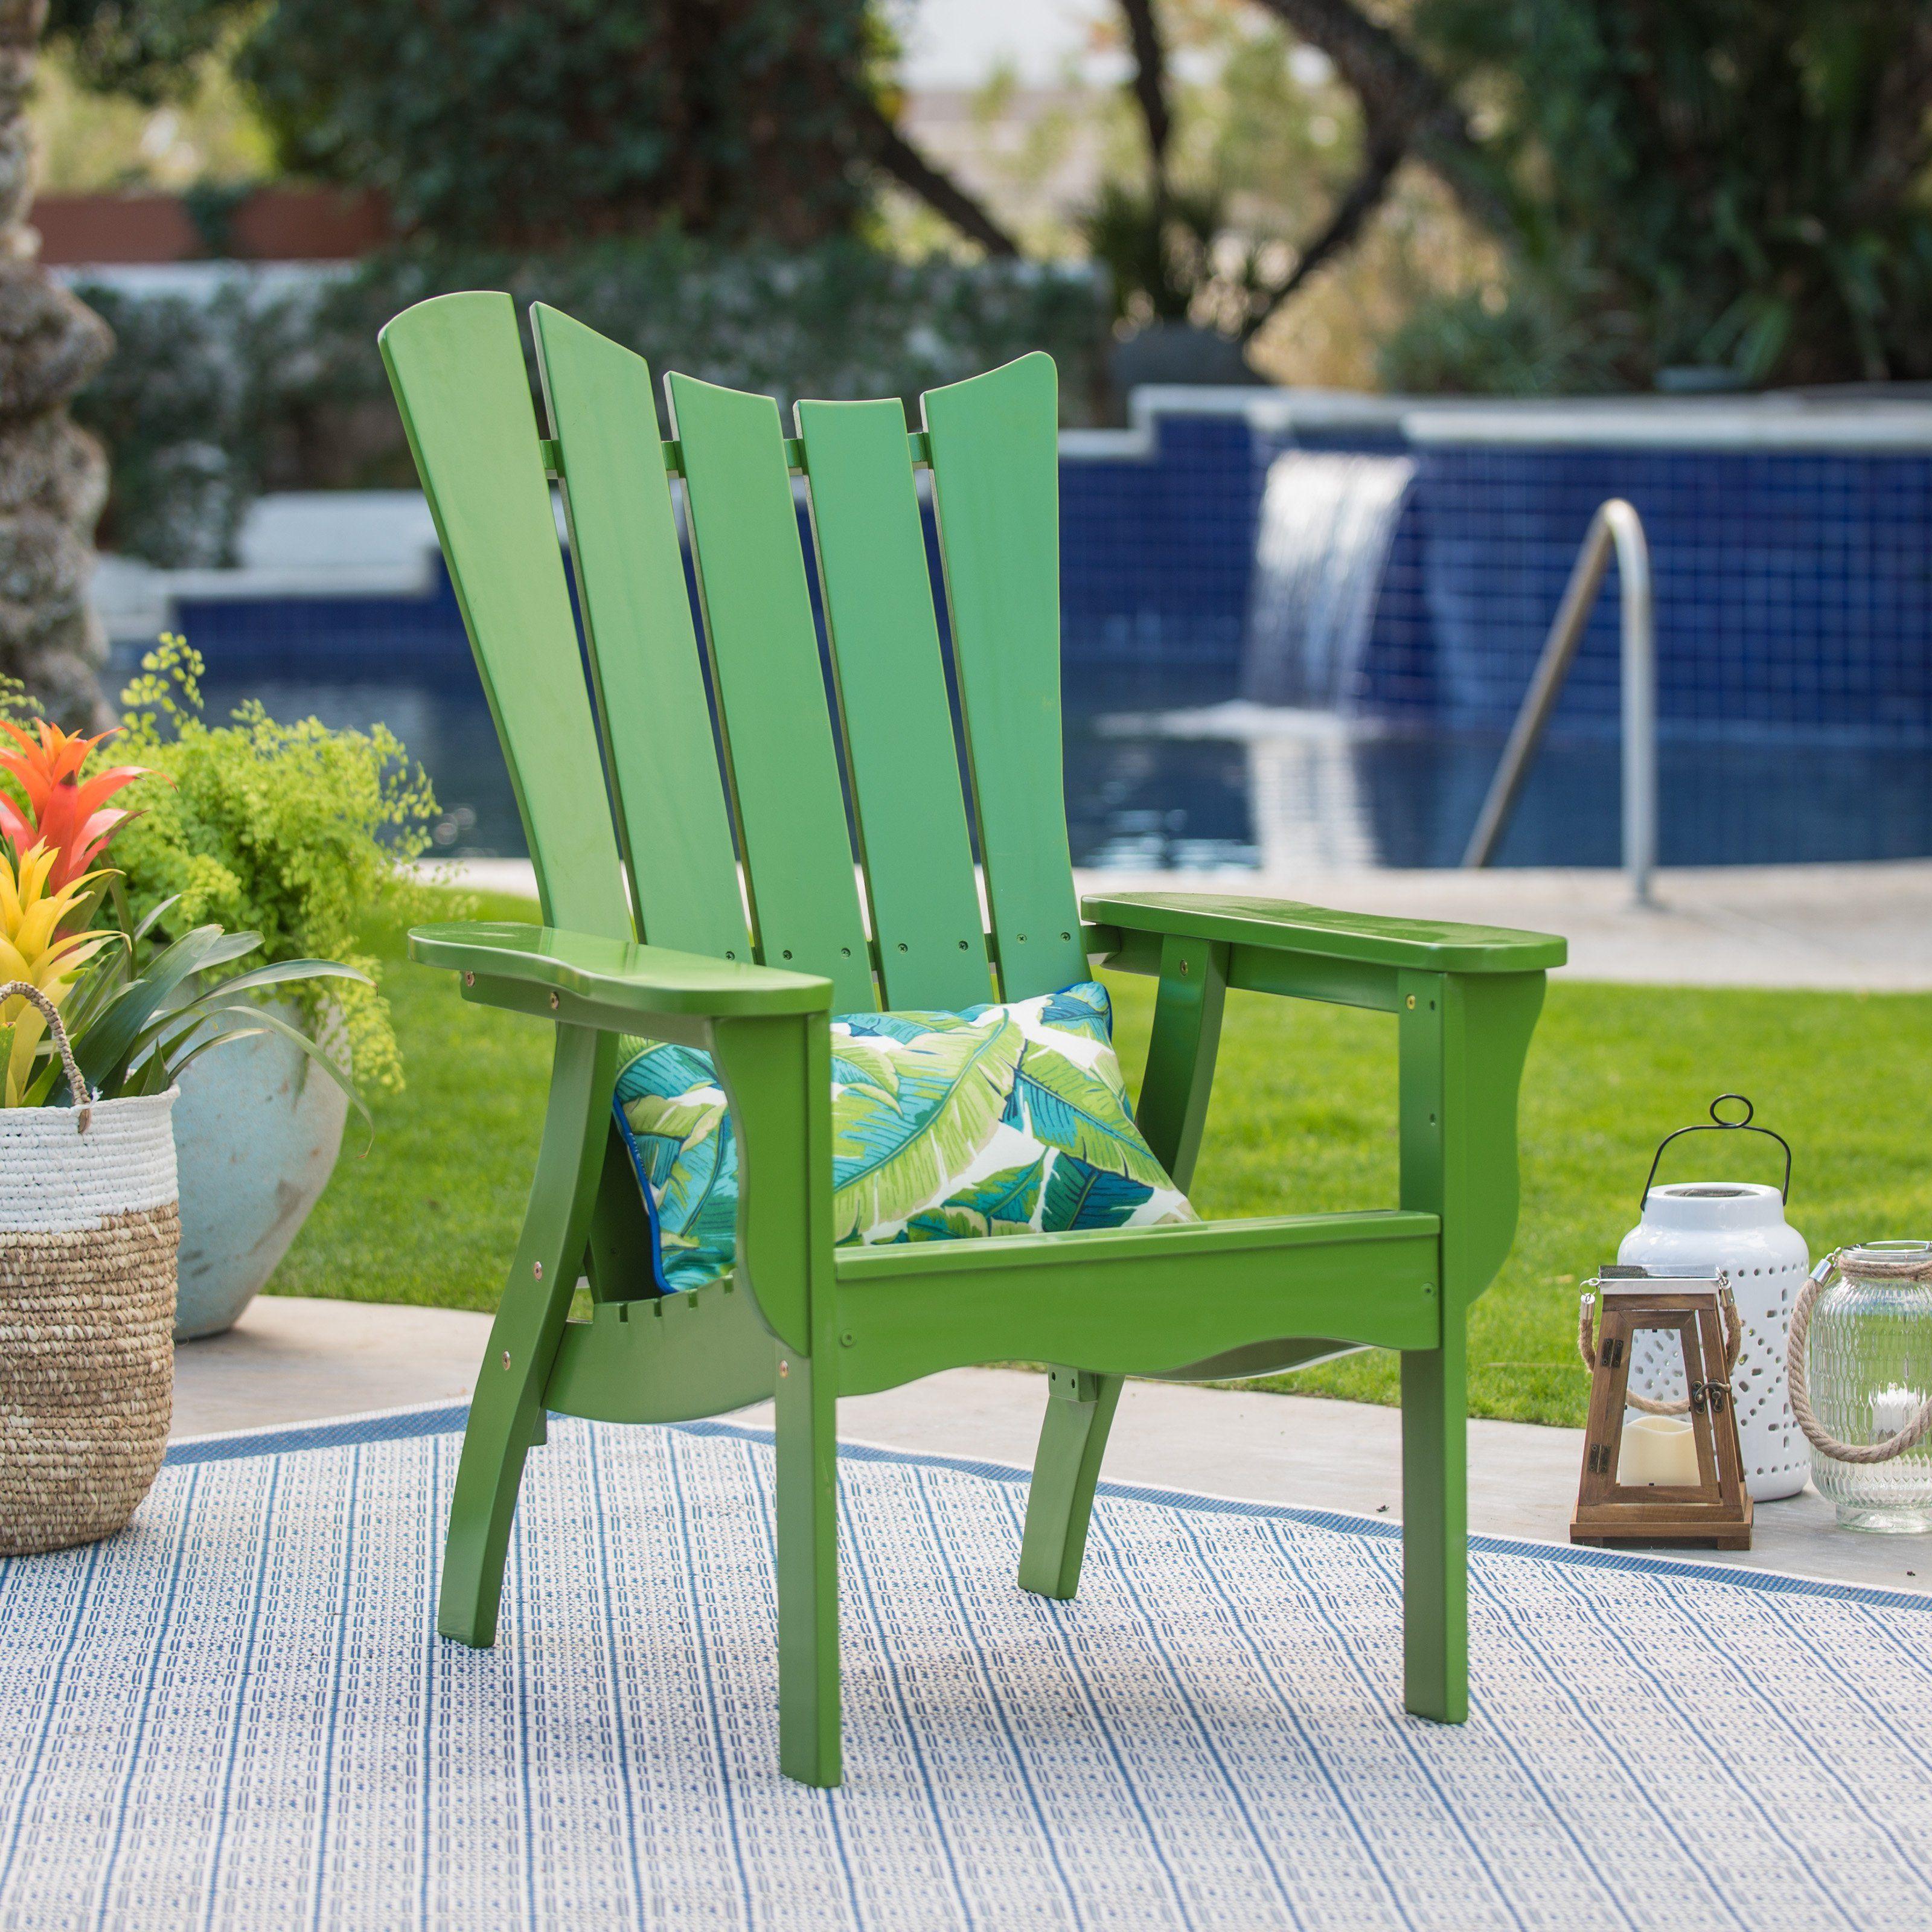 Outdoor belham living ocean wave adirondack chair green vfs